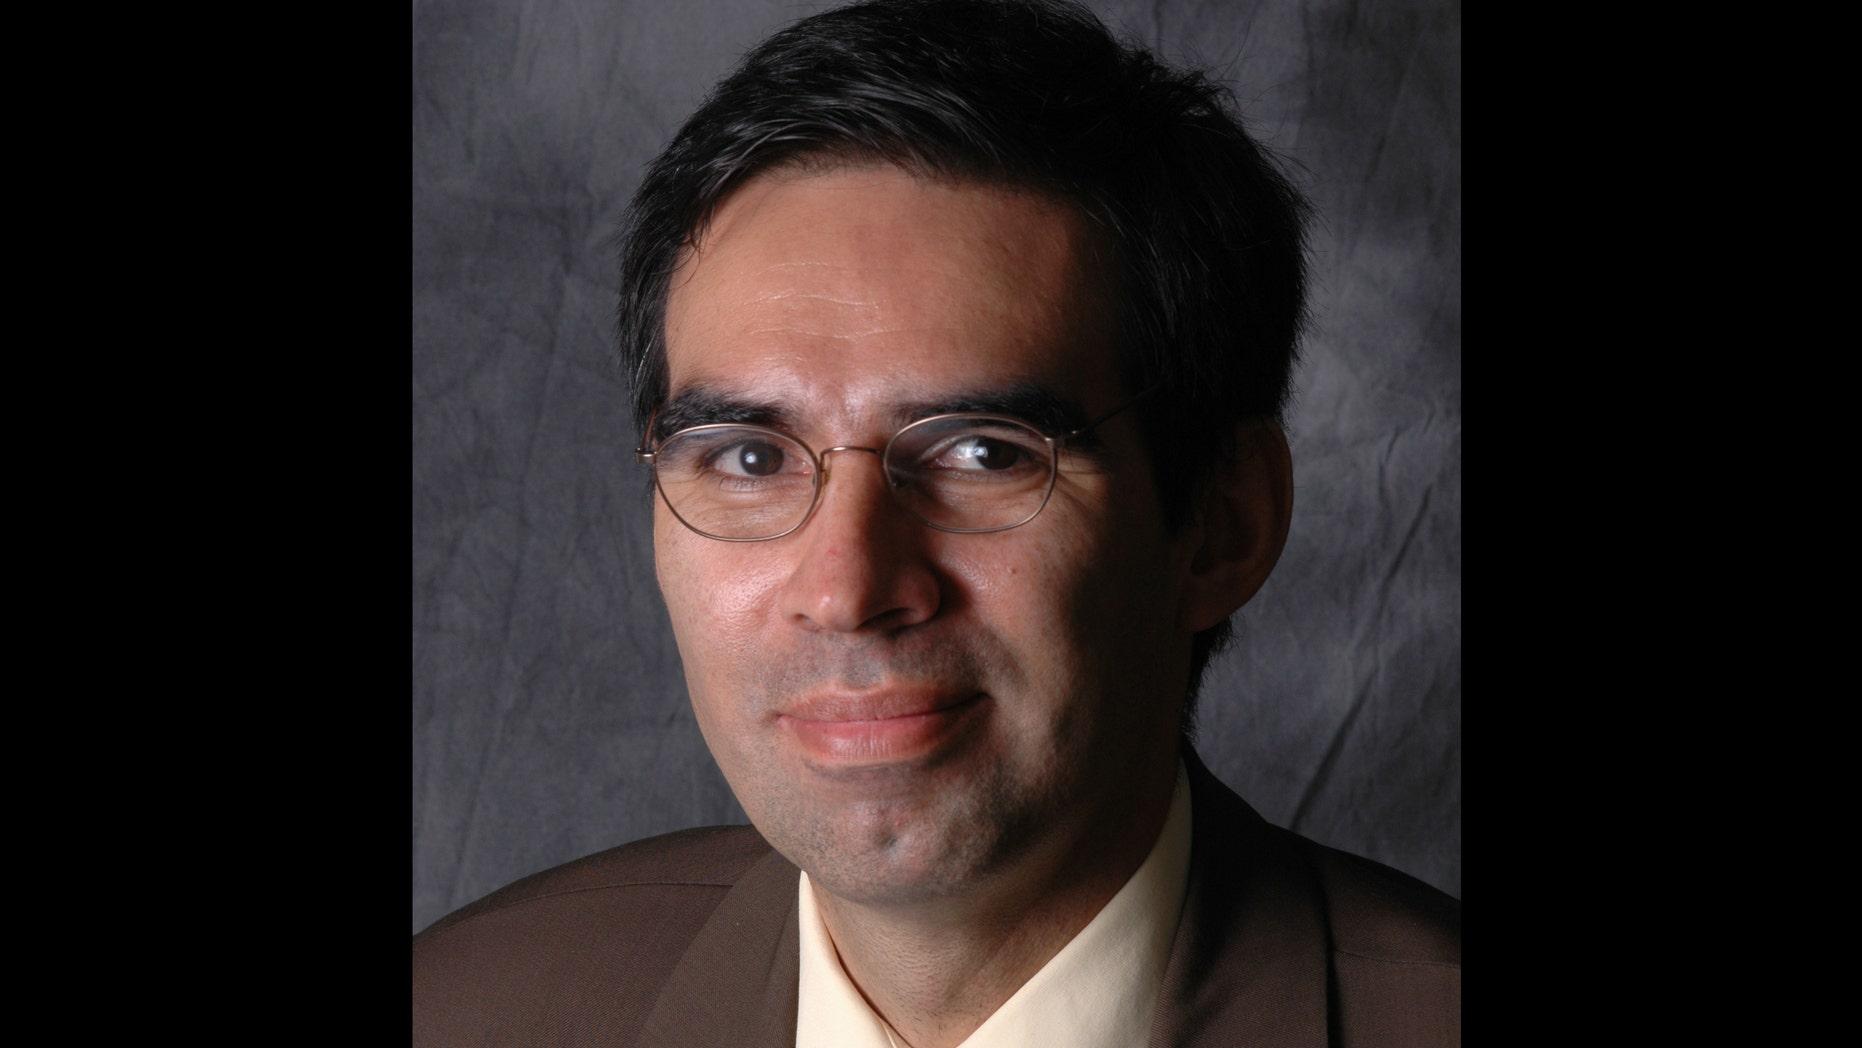 John Herrera, co-founder of the Latino Community Credit Union in North Carolina